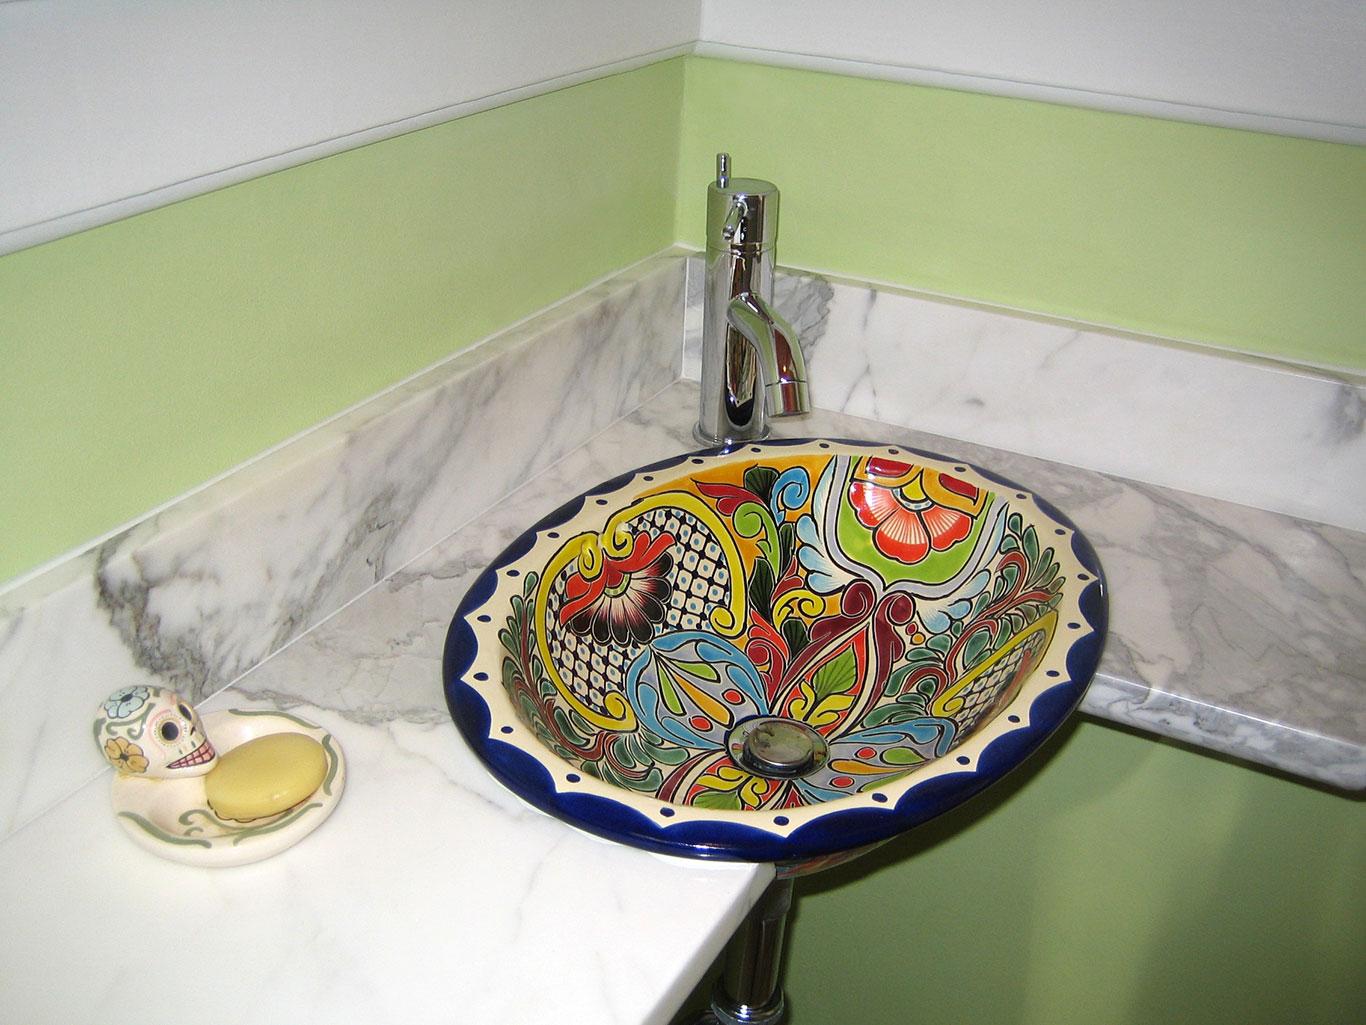 Water closet renovation.